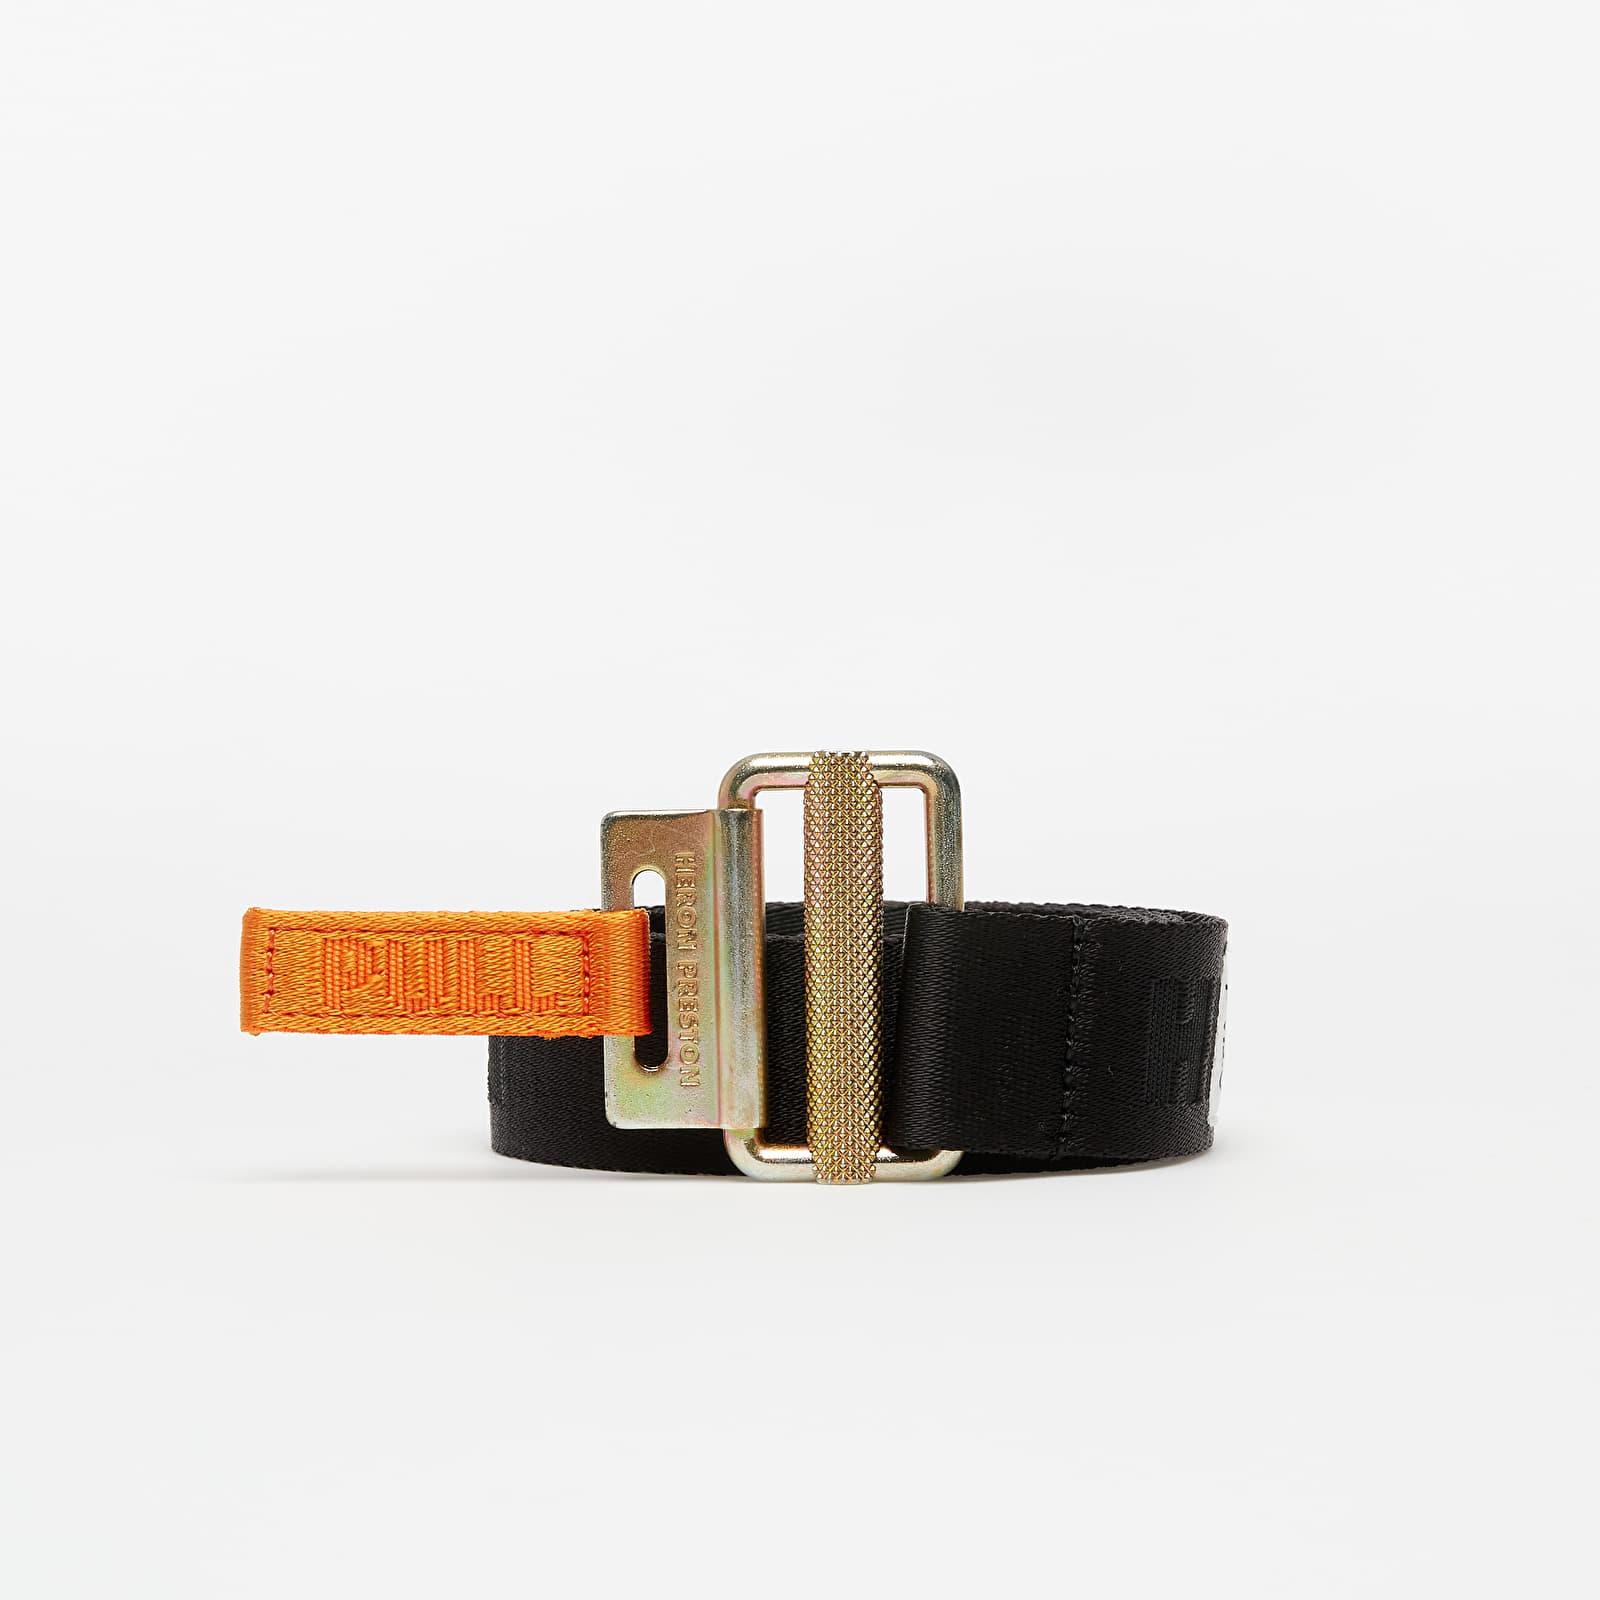 Curele HERON PRESTON Tape Mini Buckle Belt Black/ Gold